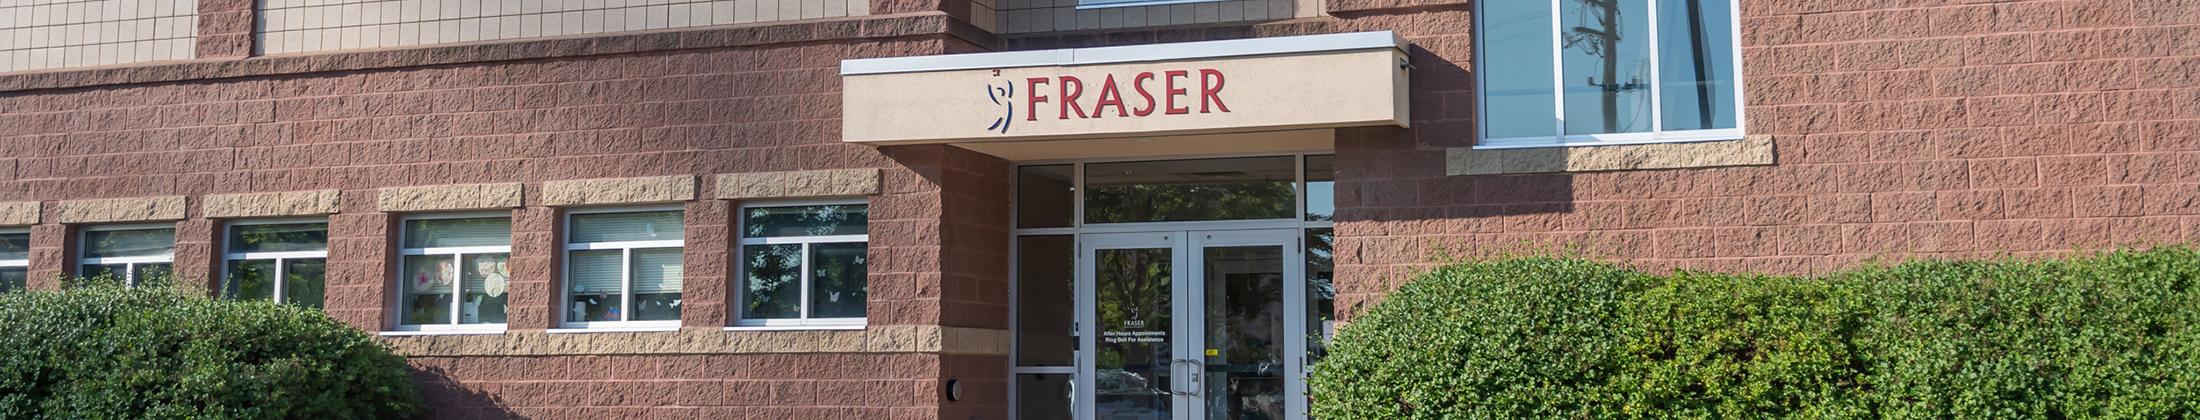 Fraser Minneapolis